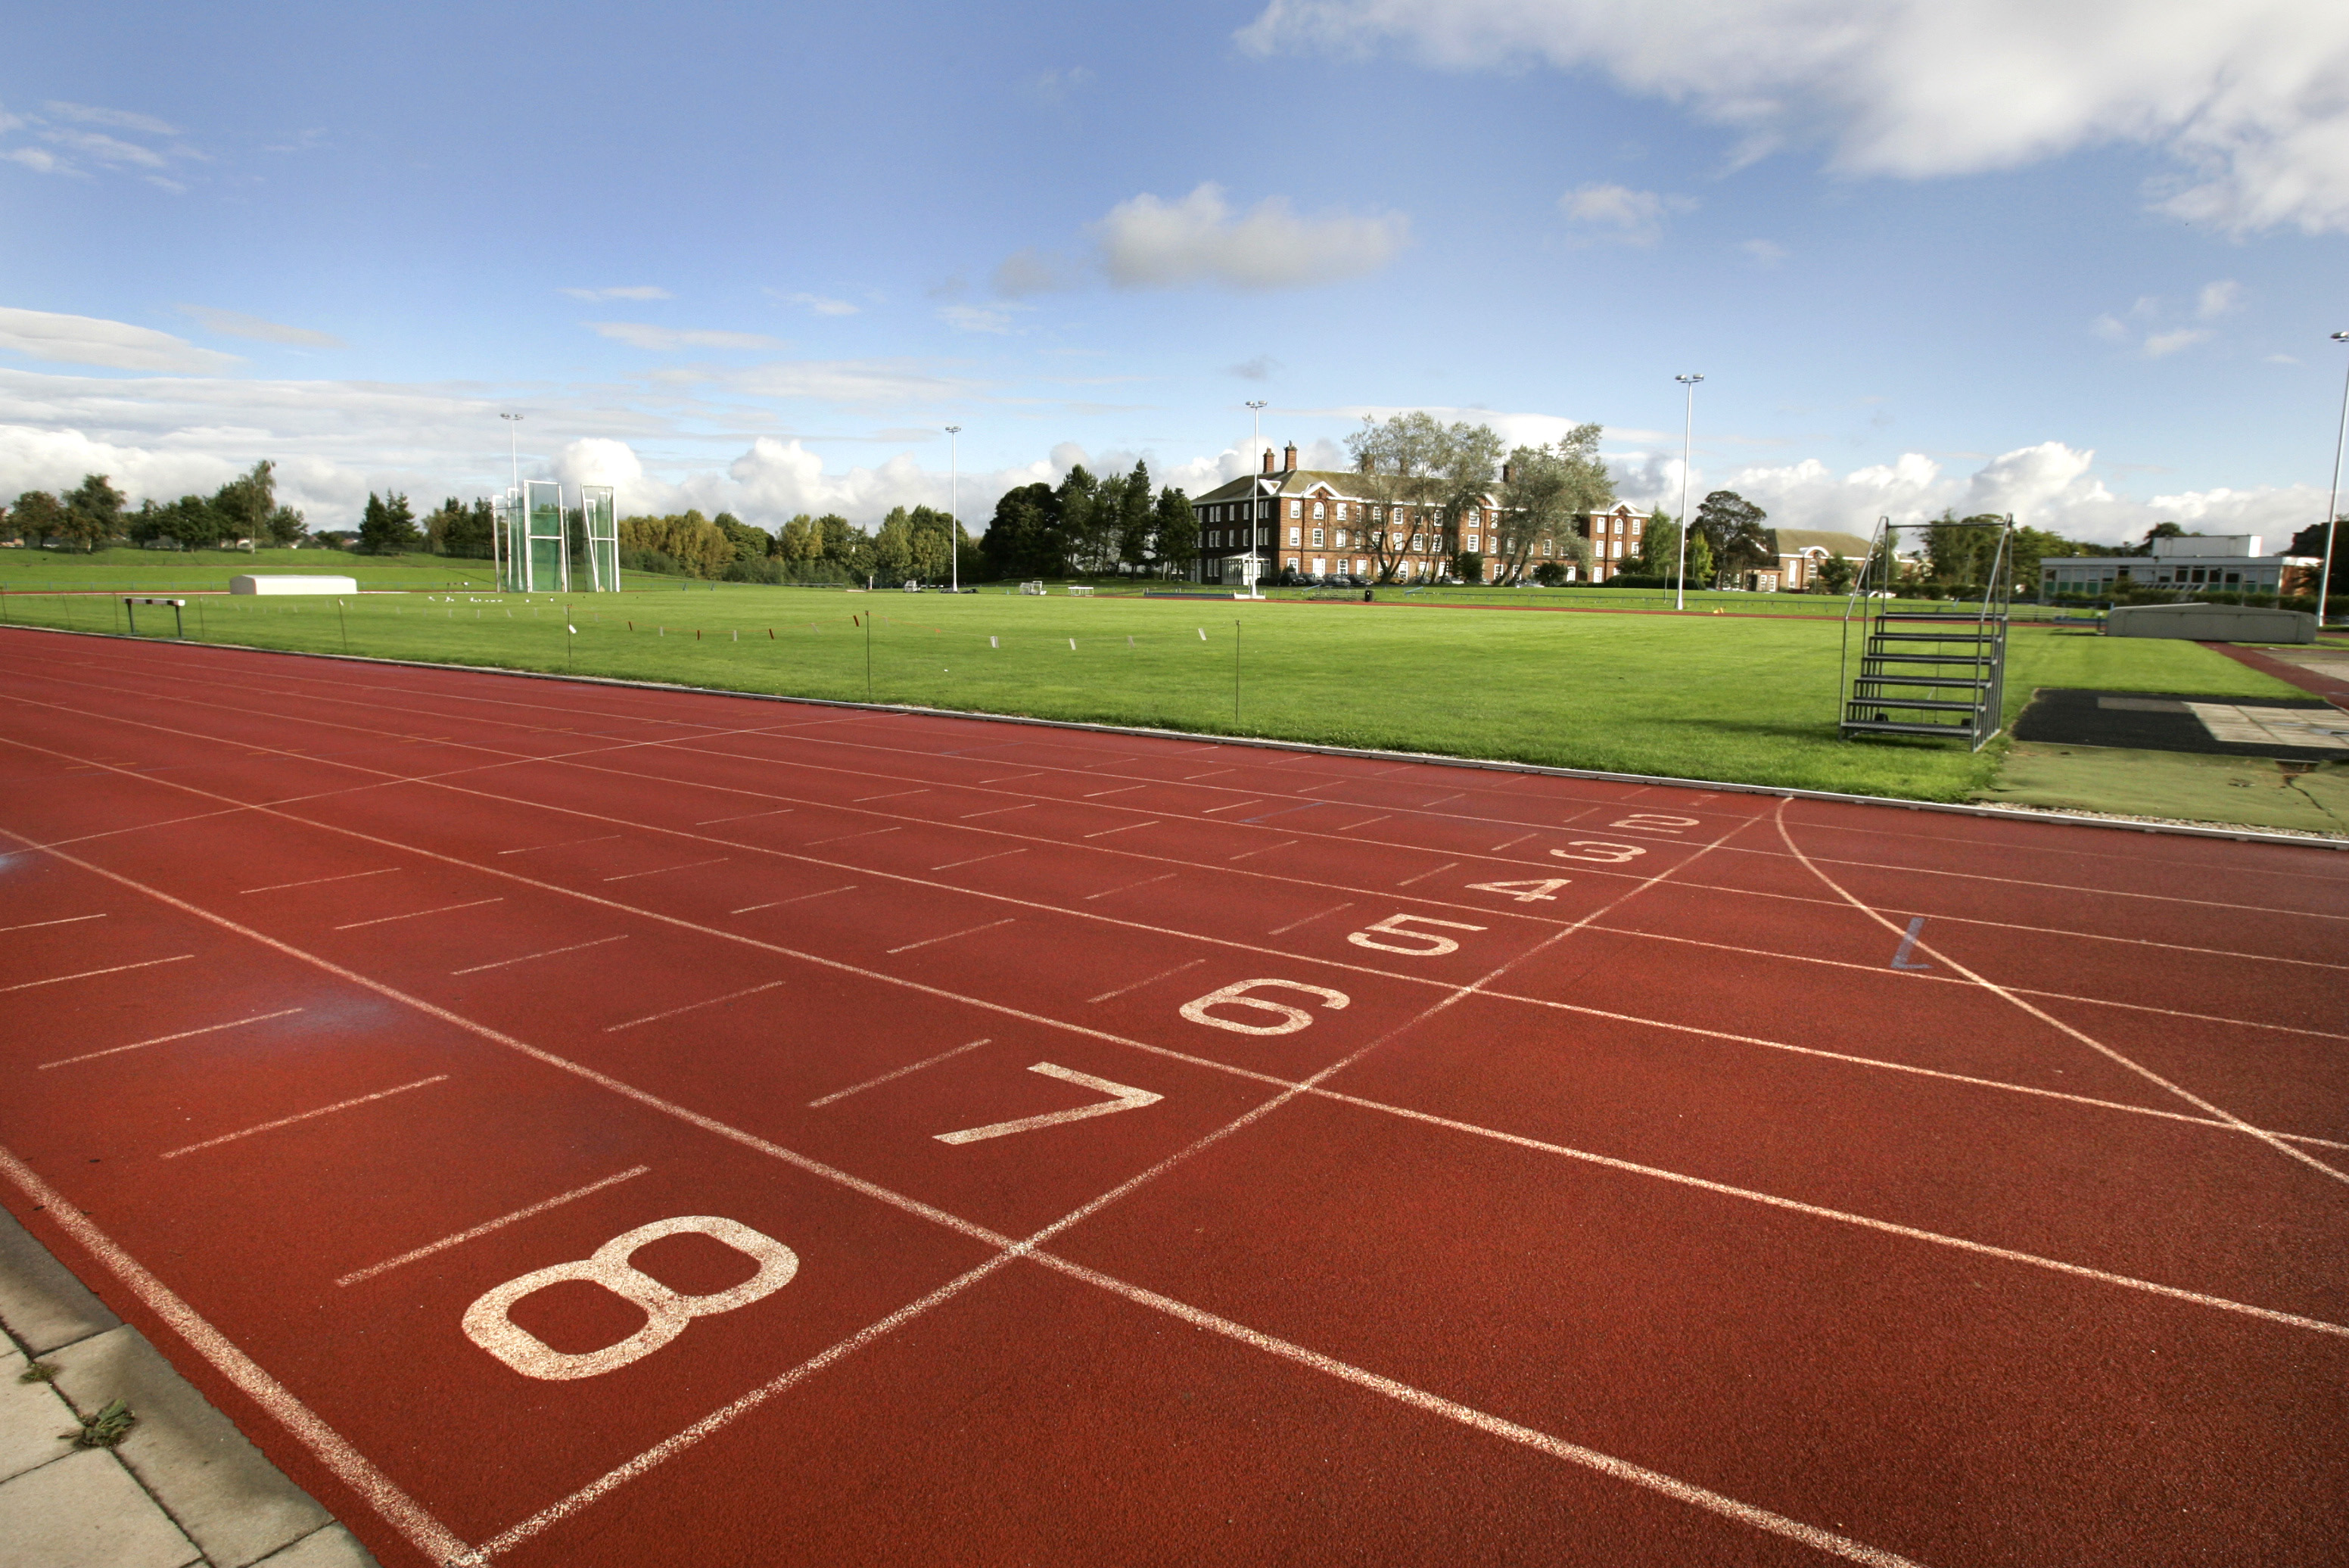 PE lessons not active enough, study concludes